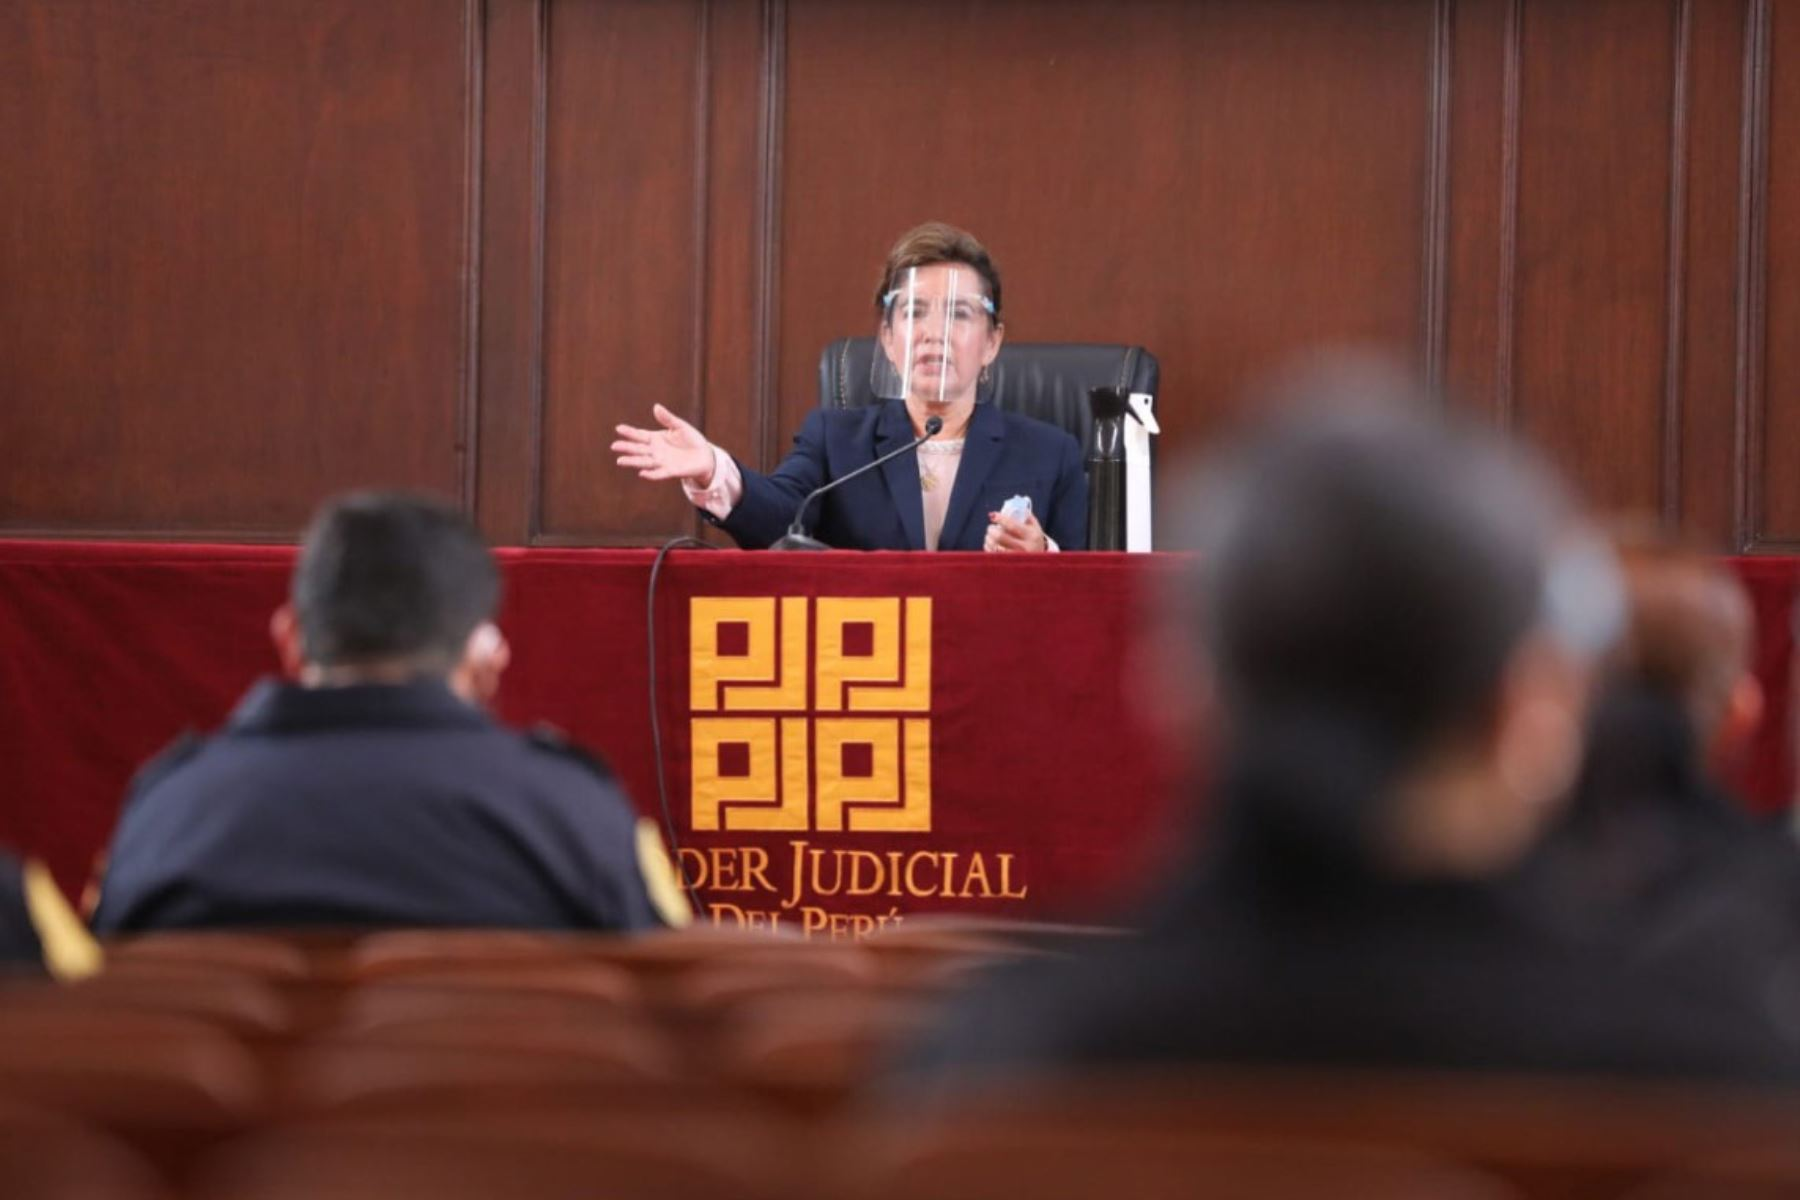 poder-judicial-usara-inteligencia-artificial-para-enfrentar-violencia-de-genero